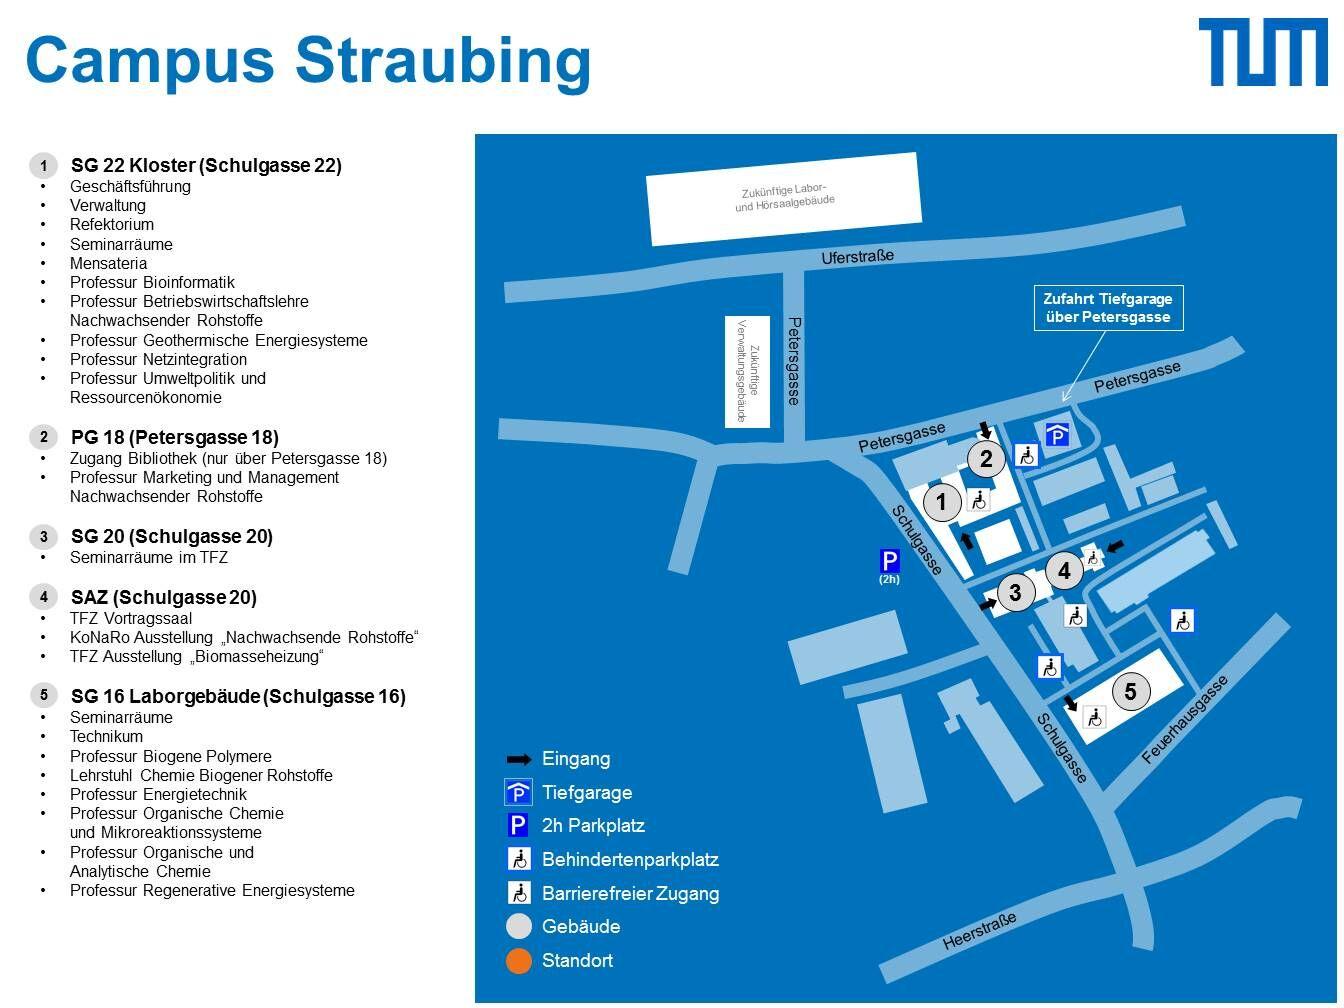 Lageplan_TUM-CampusStraubing (002)